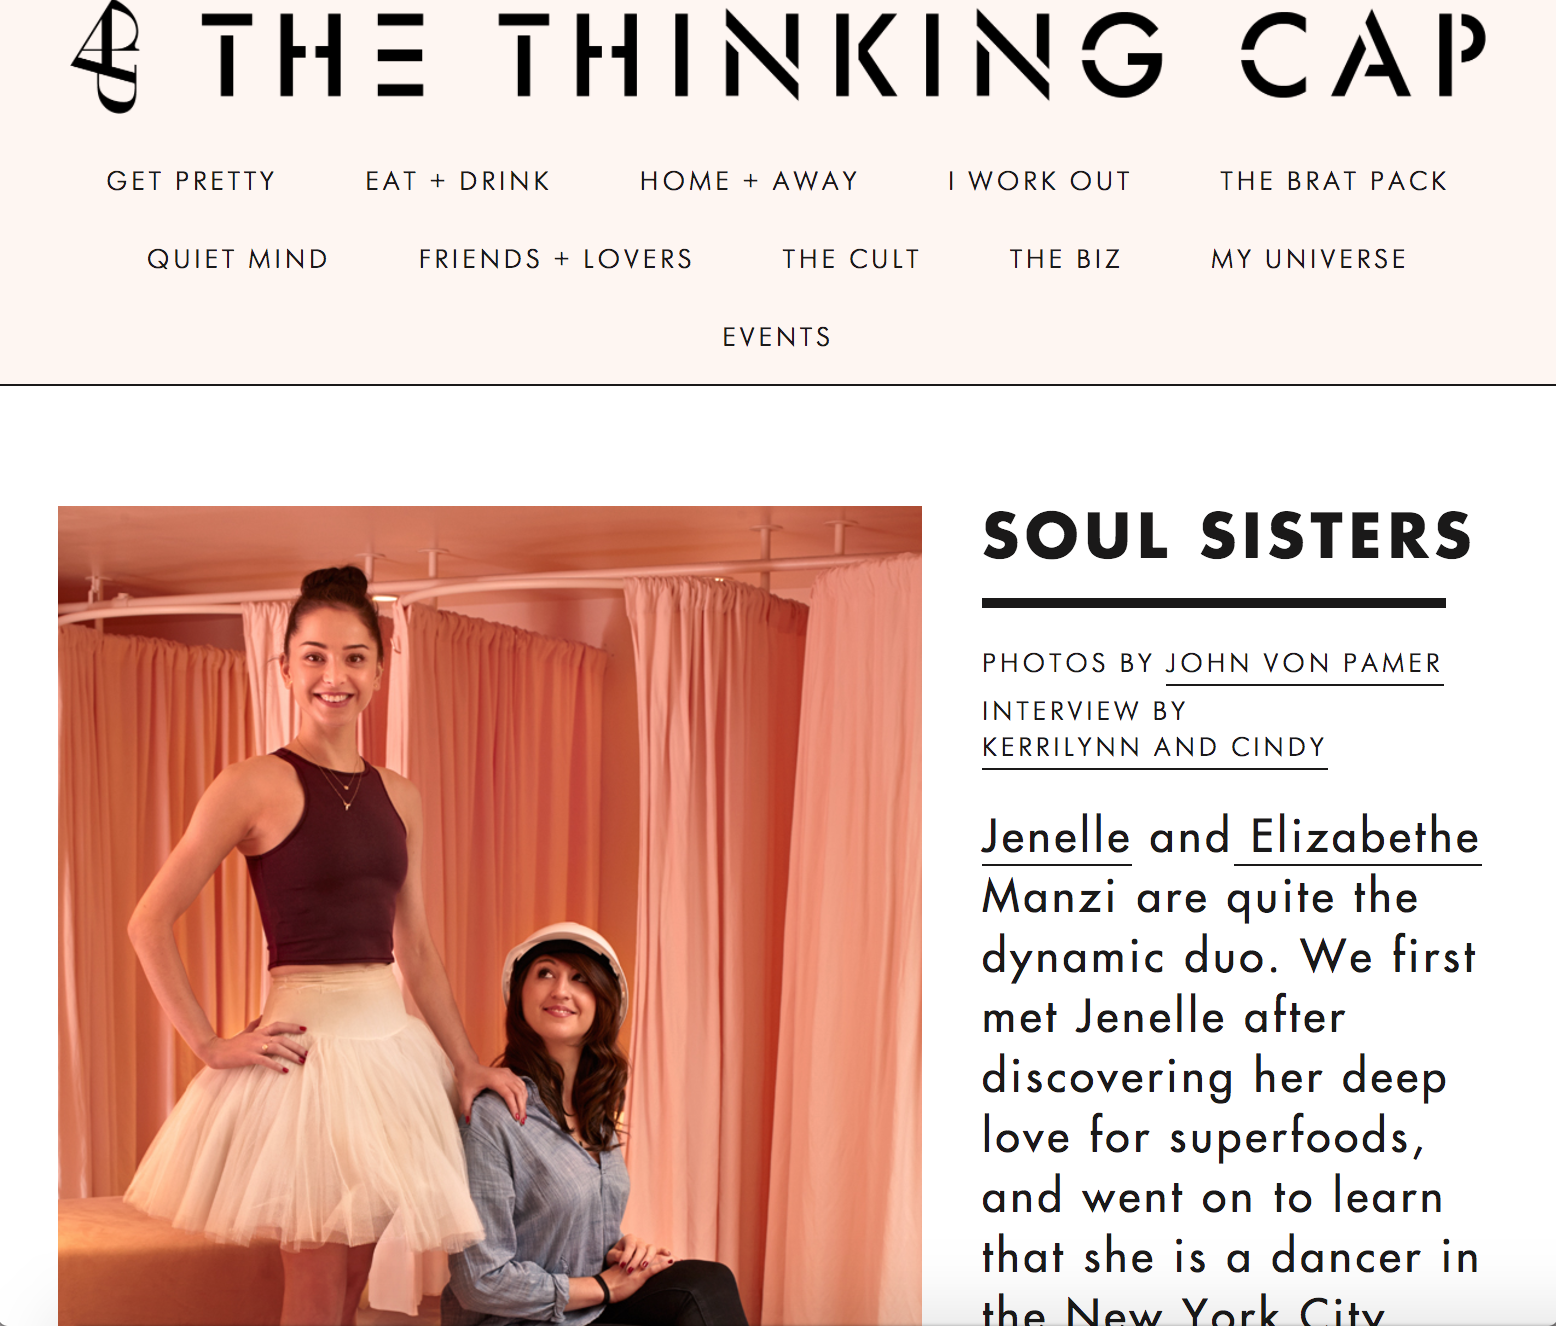 Soul Sisters - http://blog.capbeauty.com/